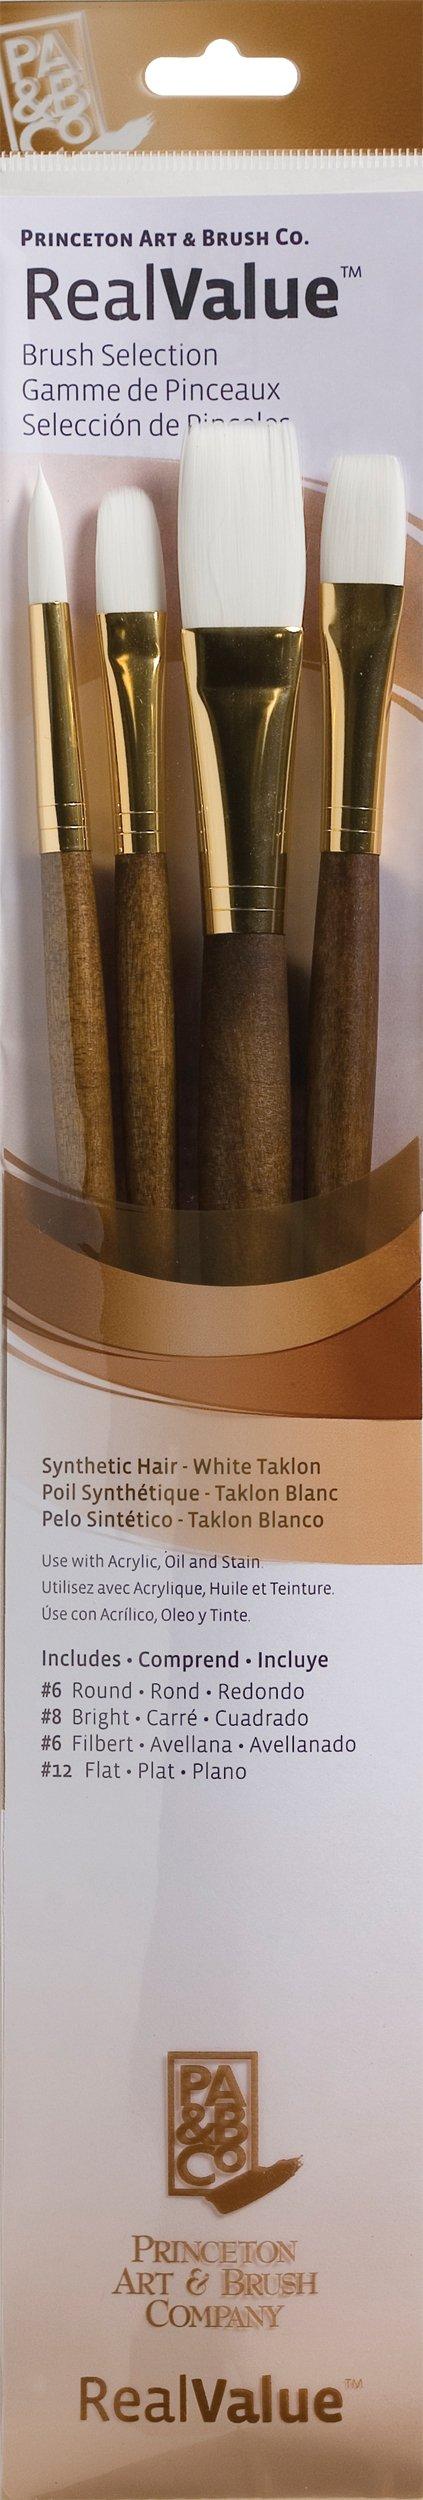 Synthetic White Taklon Real Value Brush Set, 4/Pkg by Princeton Art & Brush